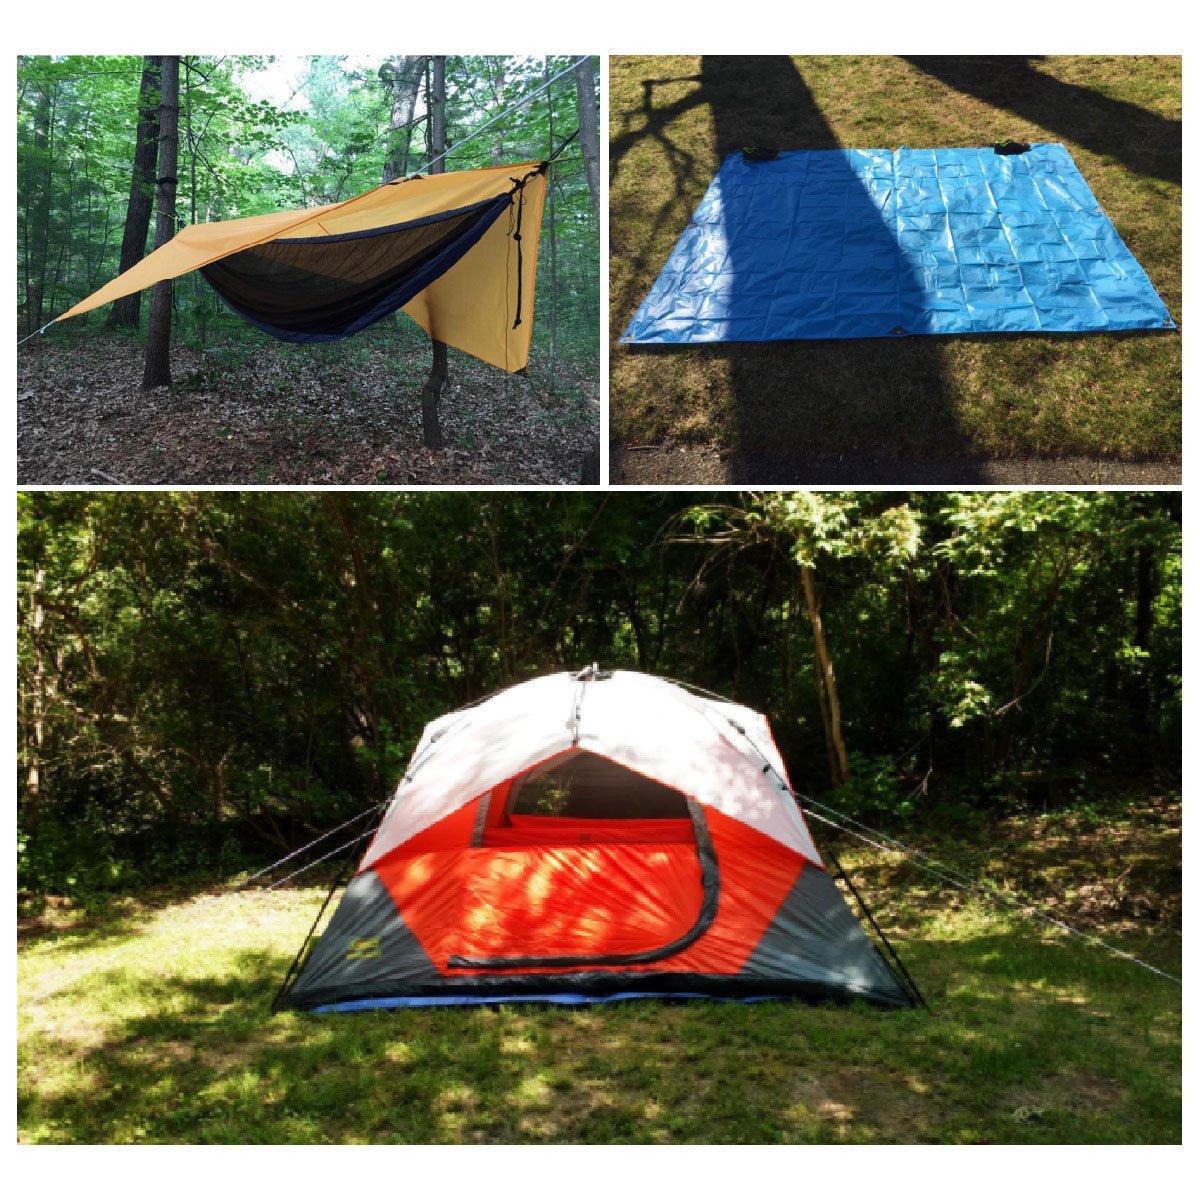 TRIWONDER Waterproof Hammock Rain Fly Tent Tarp Footprint Camping Shelter Ground Cloth Sunshade Mat for Outdoor Hiking Beach Picnic OS1603